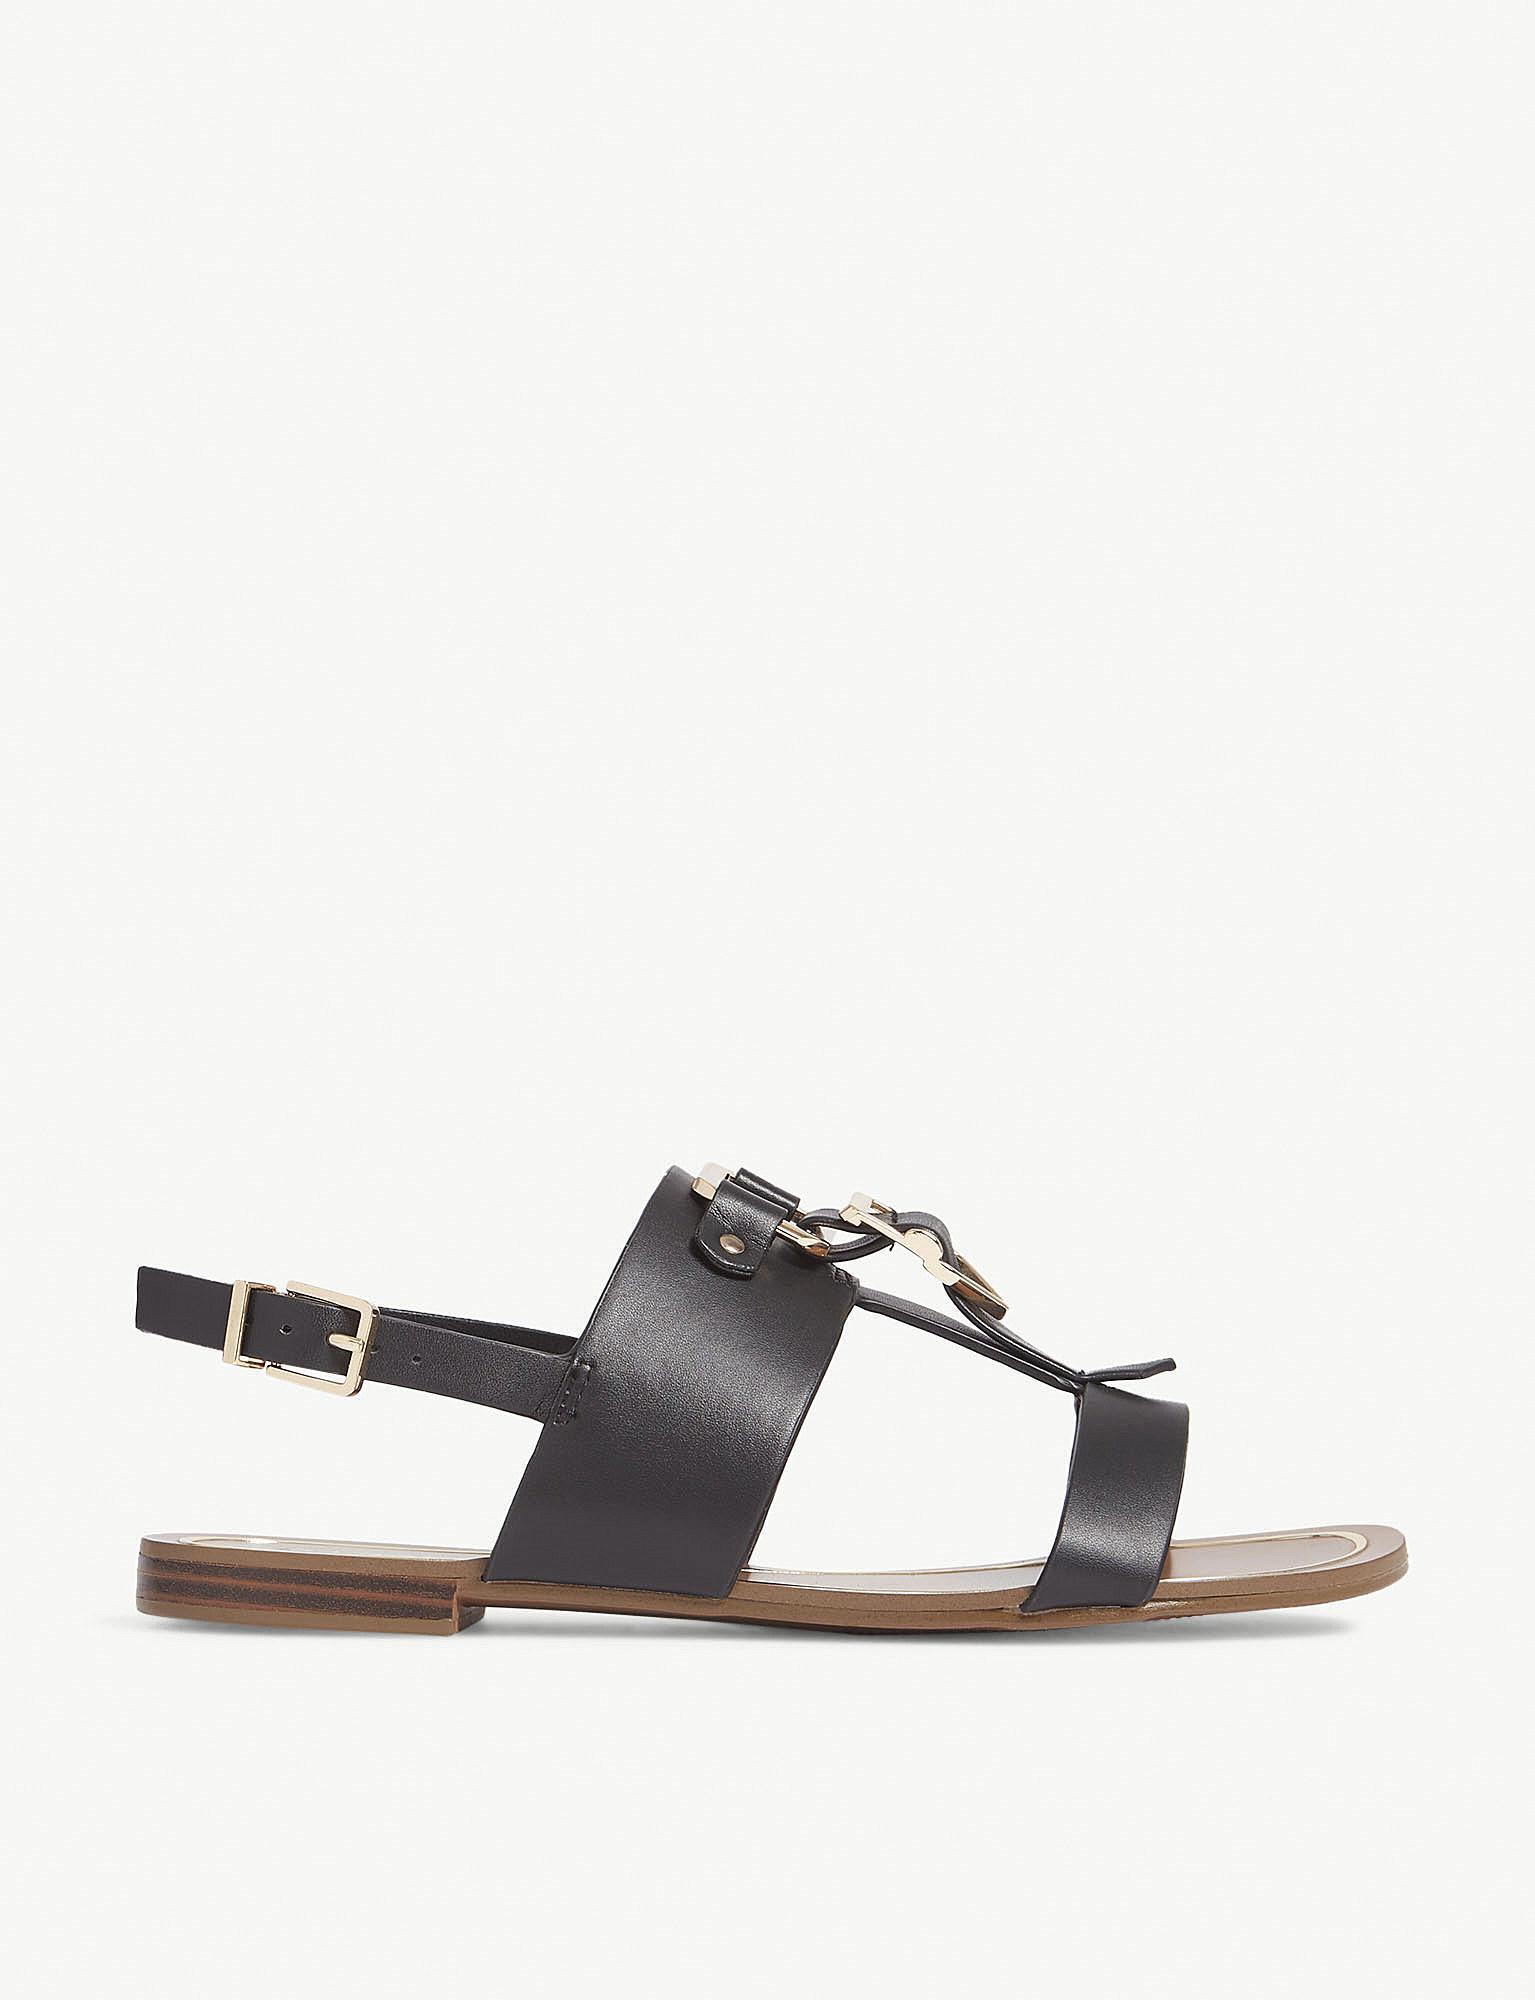 d472deca2b45 Lyst - ALDO Afiarien Buckle Sandals in Black